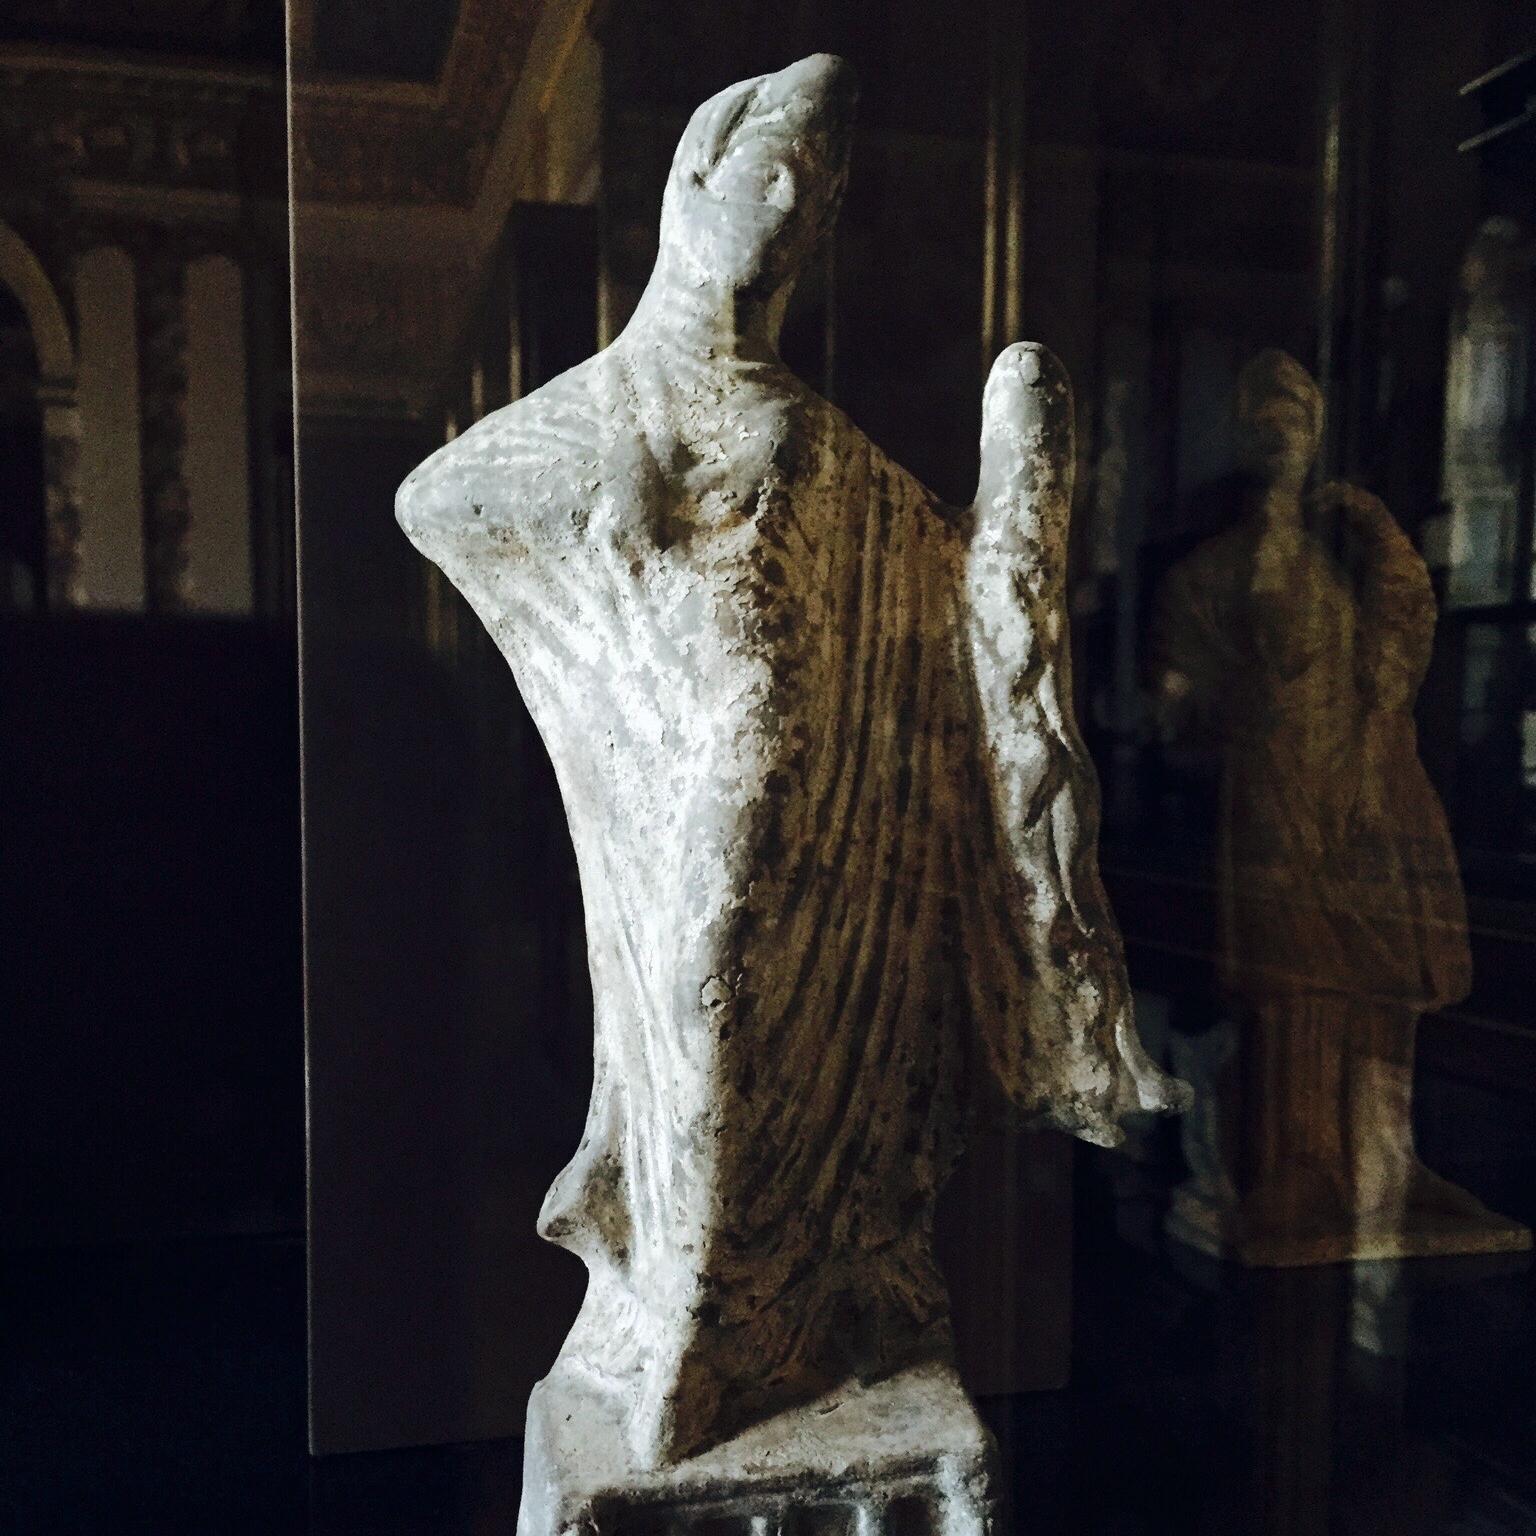 Greek Tanagra Figurine - Fully Veiled